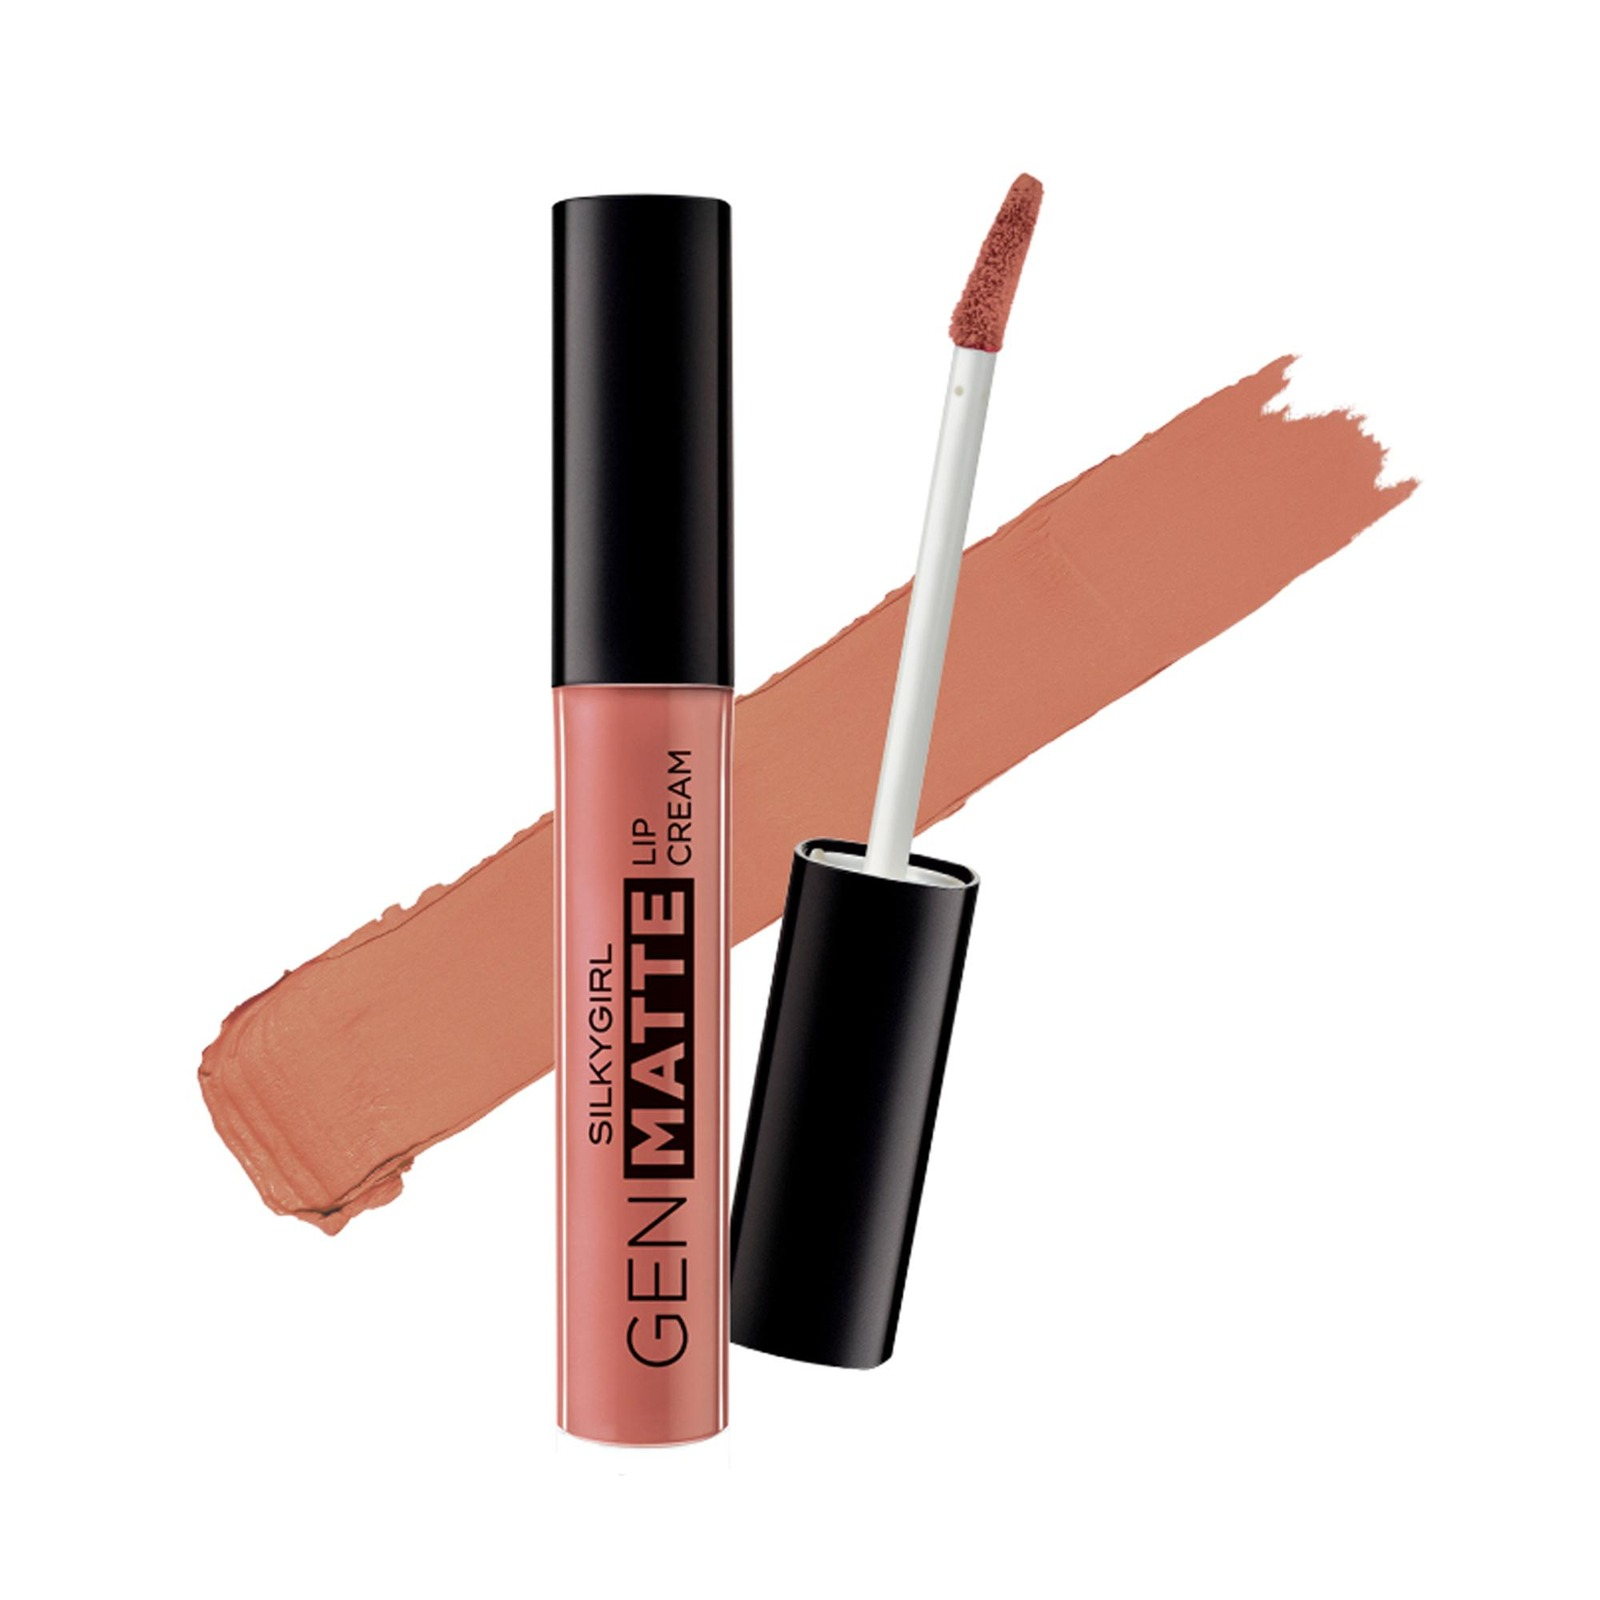 SILKYGIRL Gen Matte Lip Cream 01 Just Nude